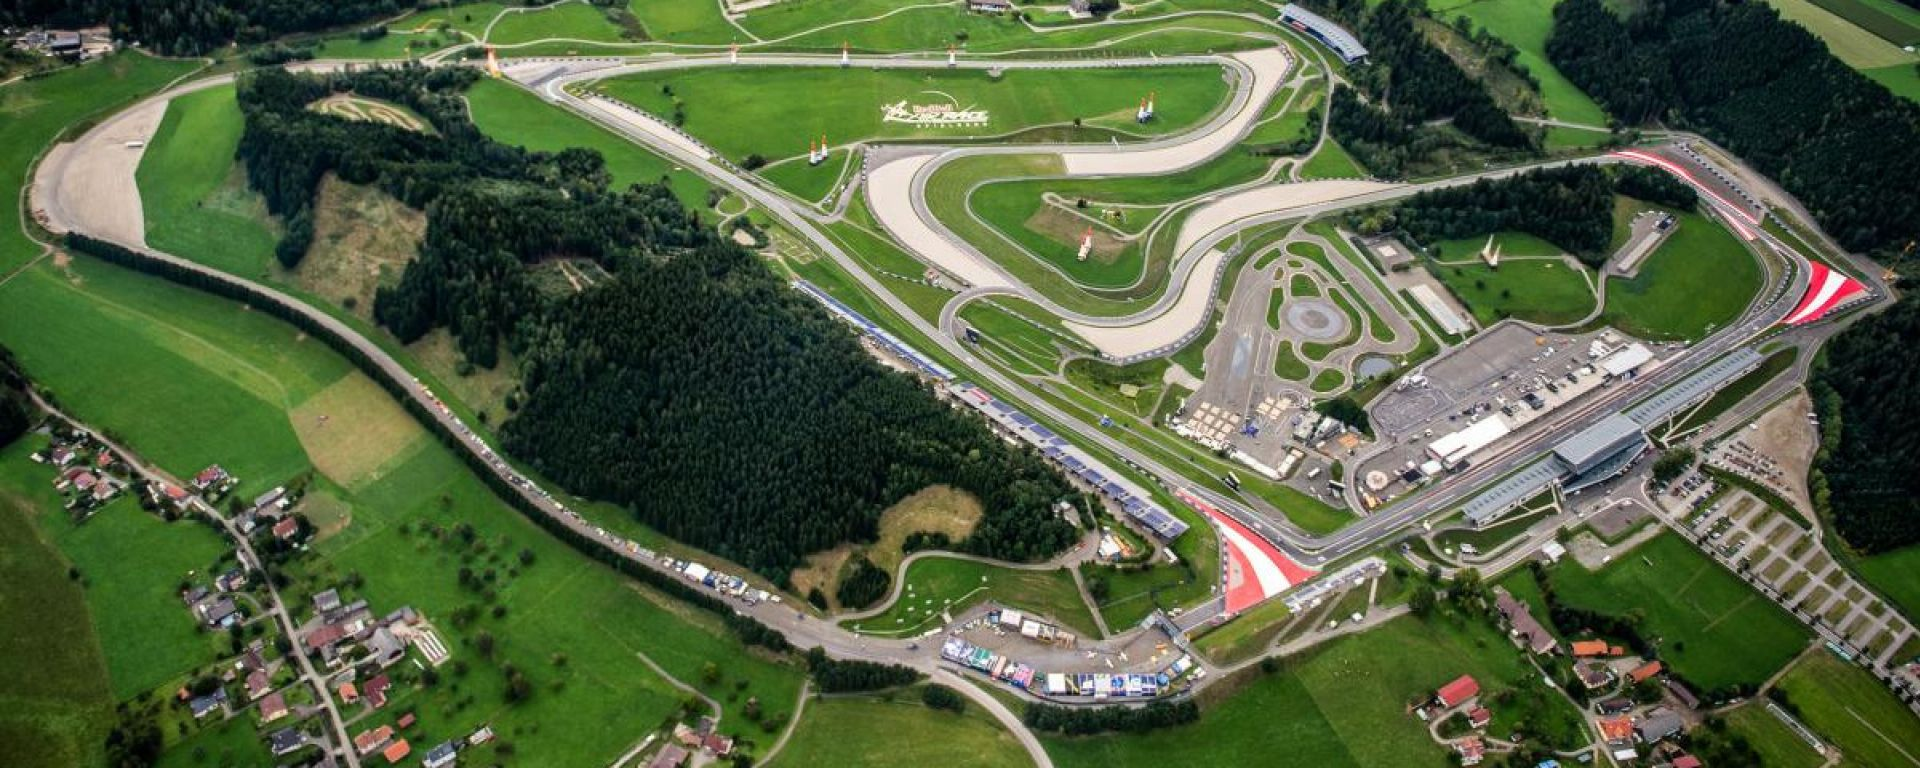 Red Bull Ring, Spielberg (Austria)